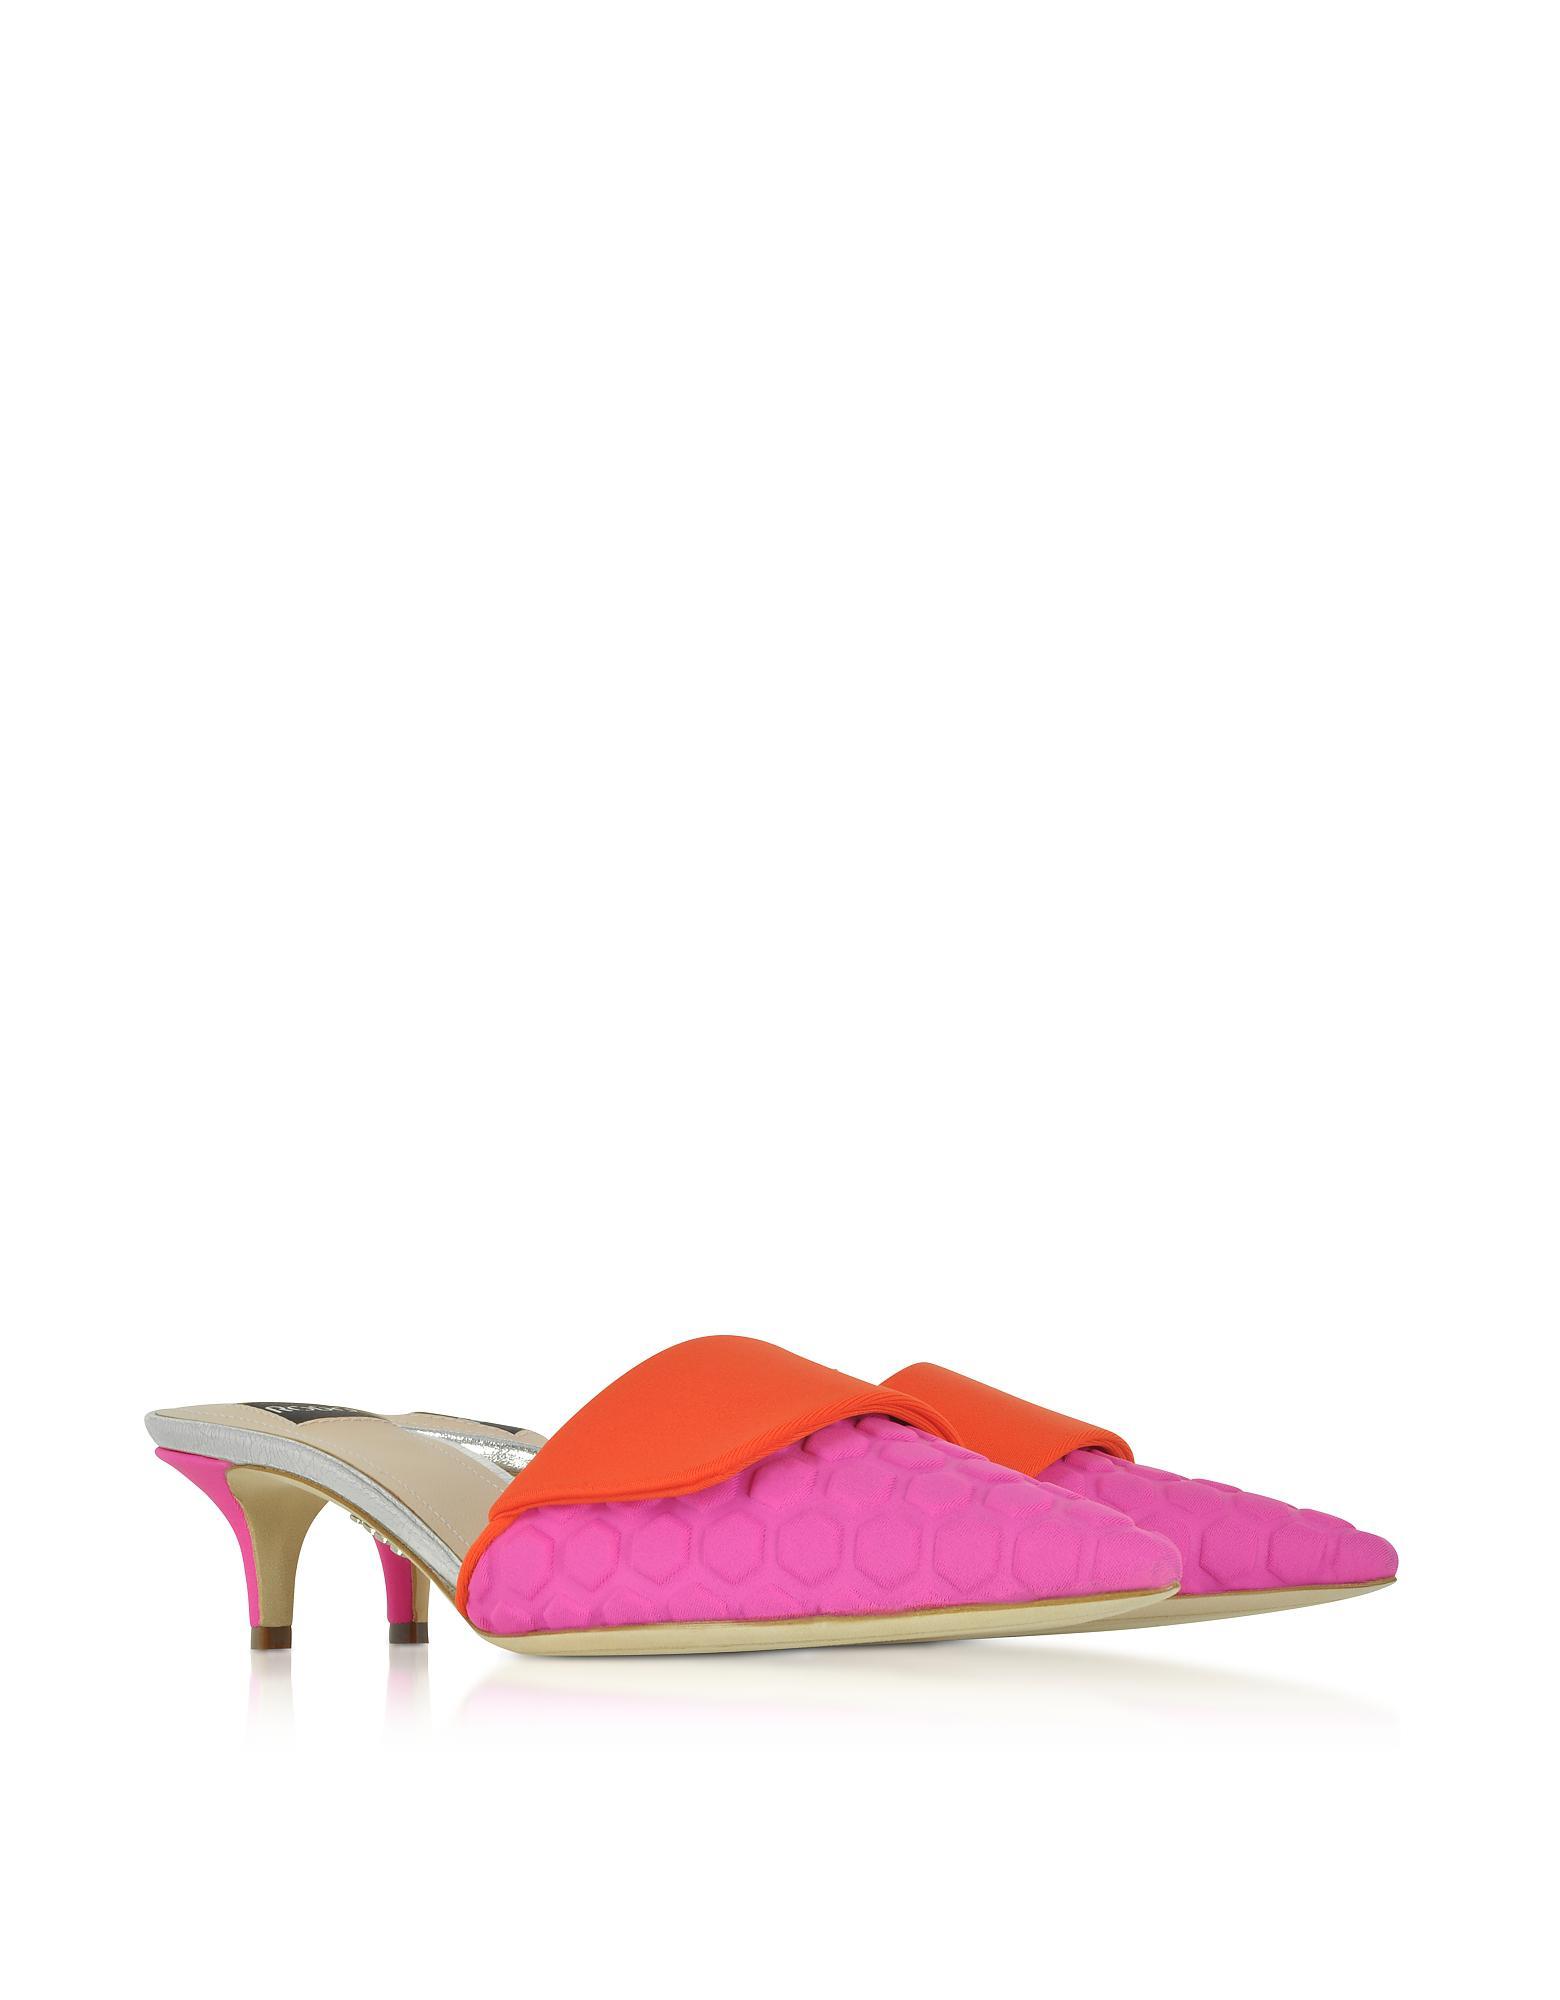 RODO Designer Shoes, Fuchsia and Scuba Fabric Kitten Heel Mules